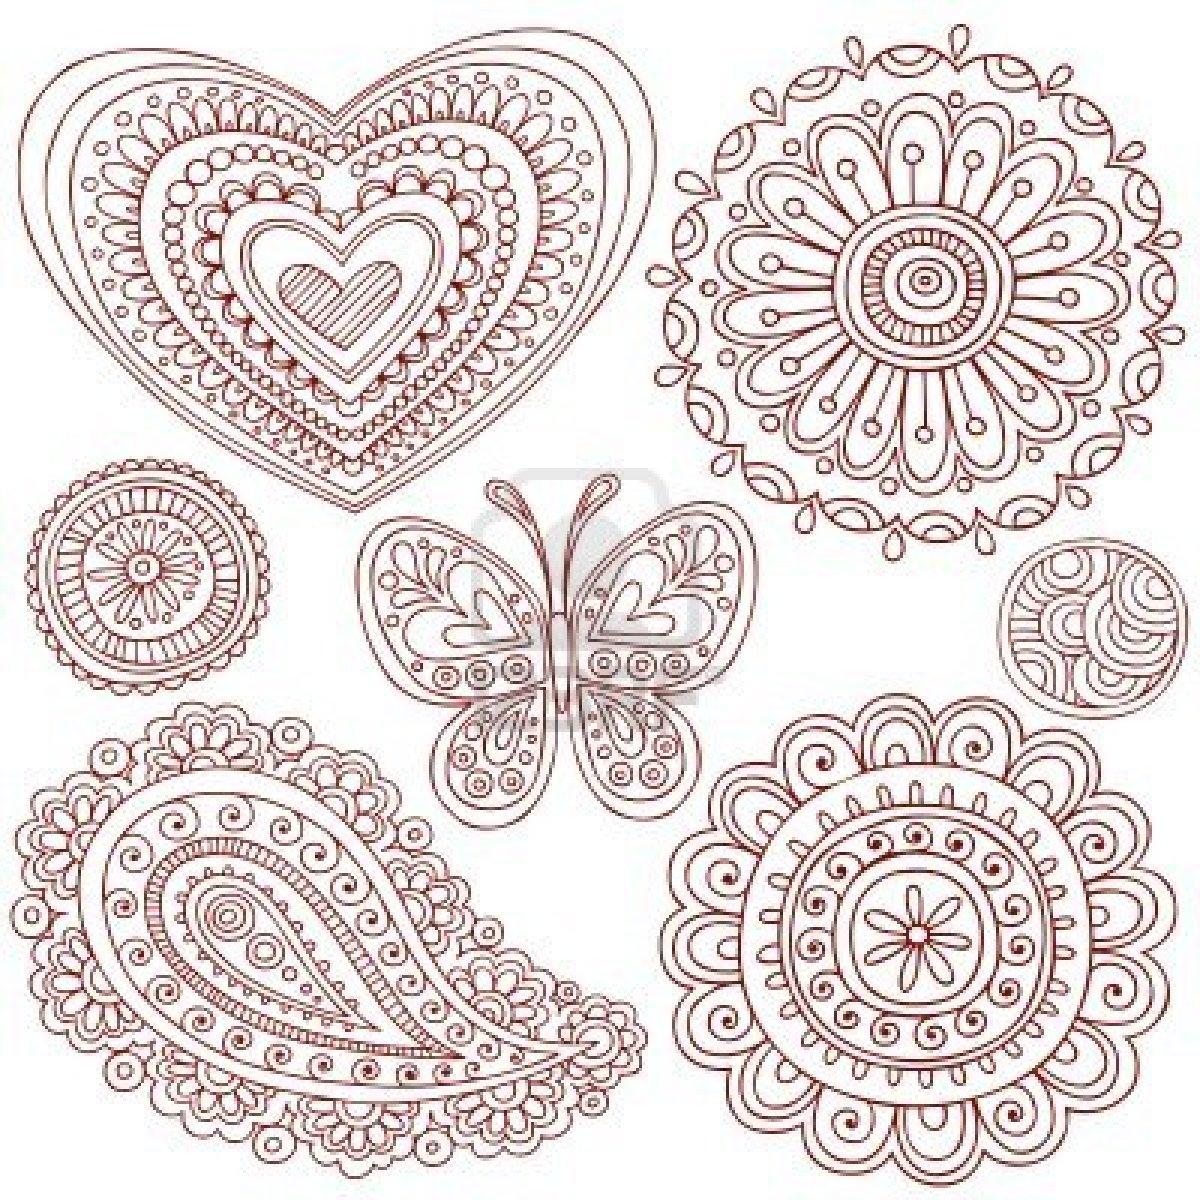 Drawn mehndi hand 6807551 hand flower butterfly mehndi